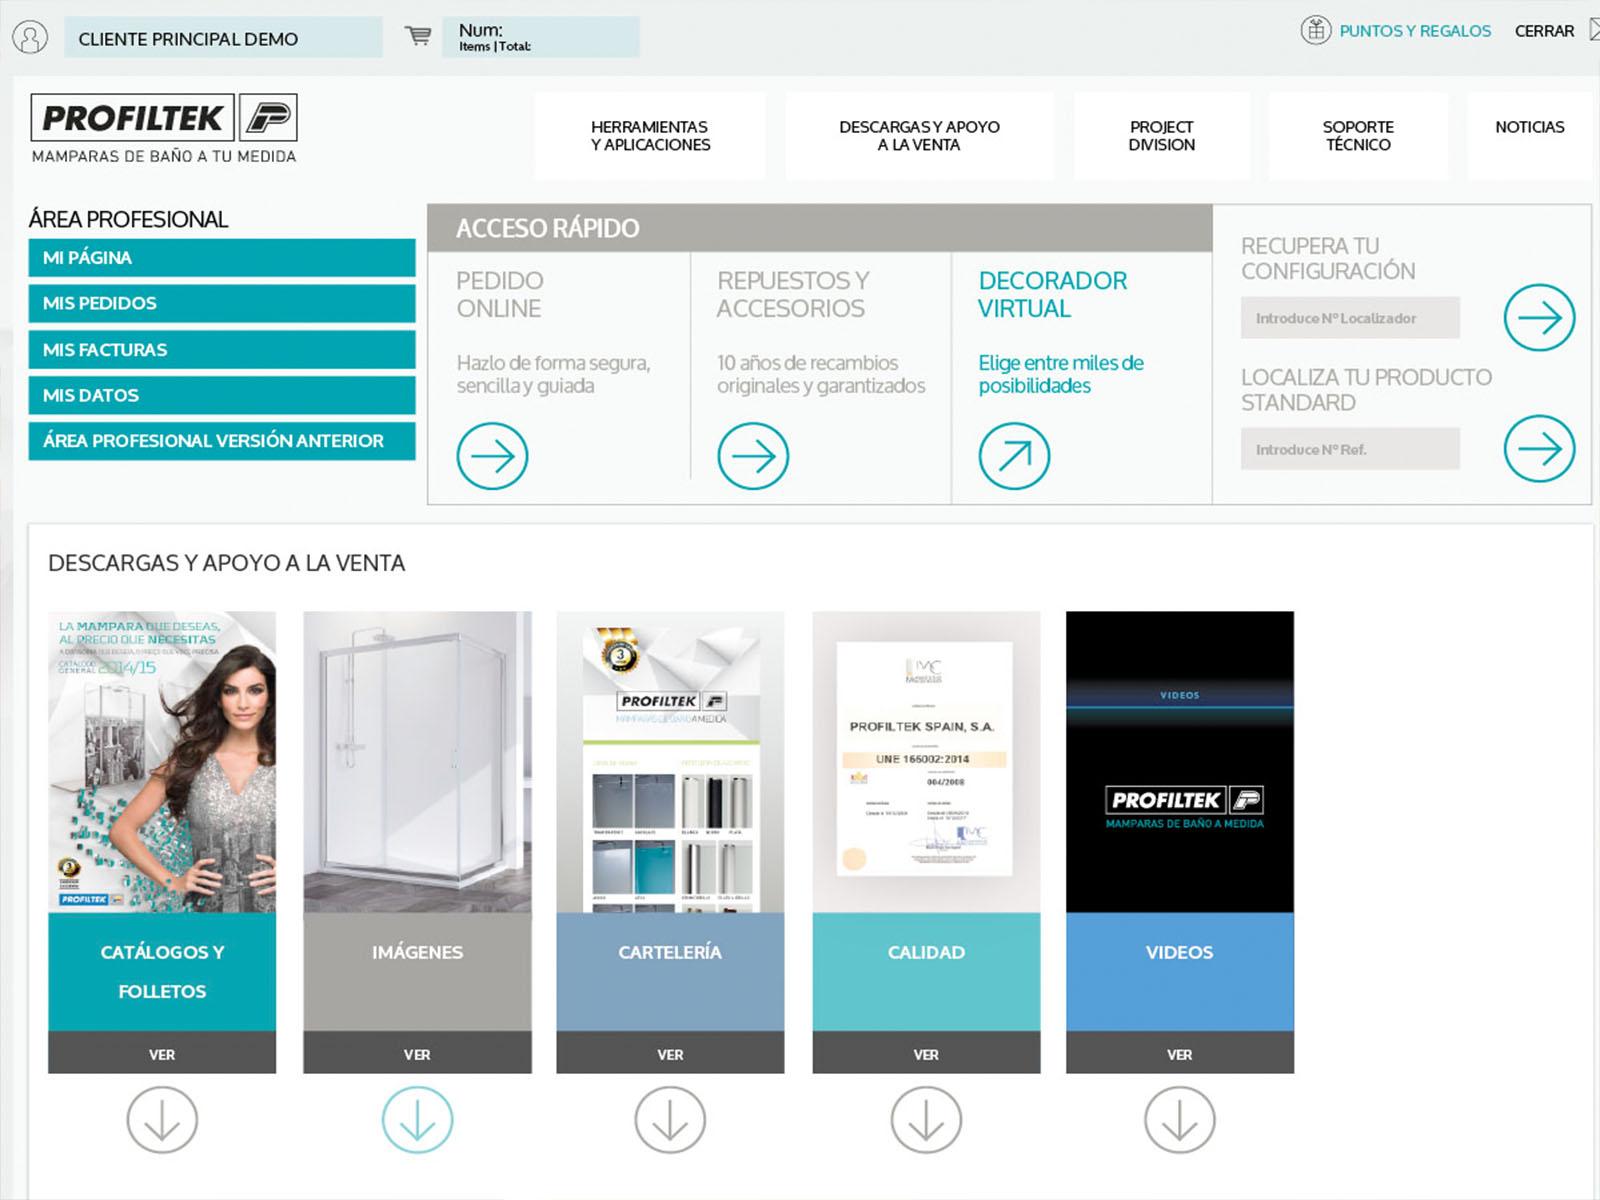 profiltek-area-profesional-web